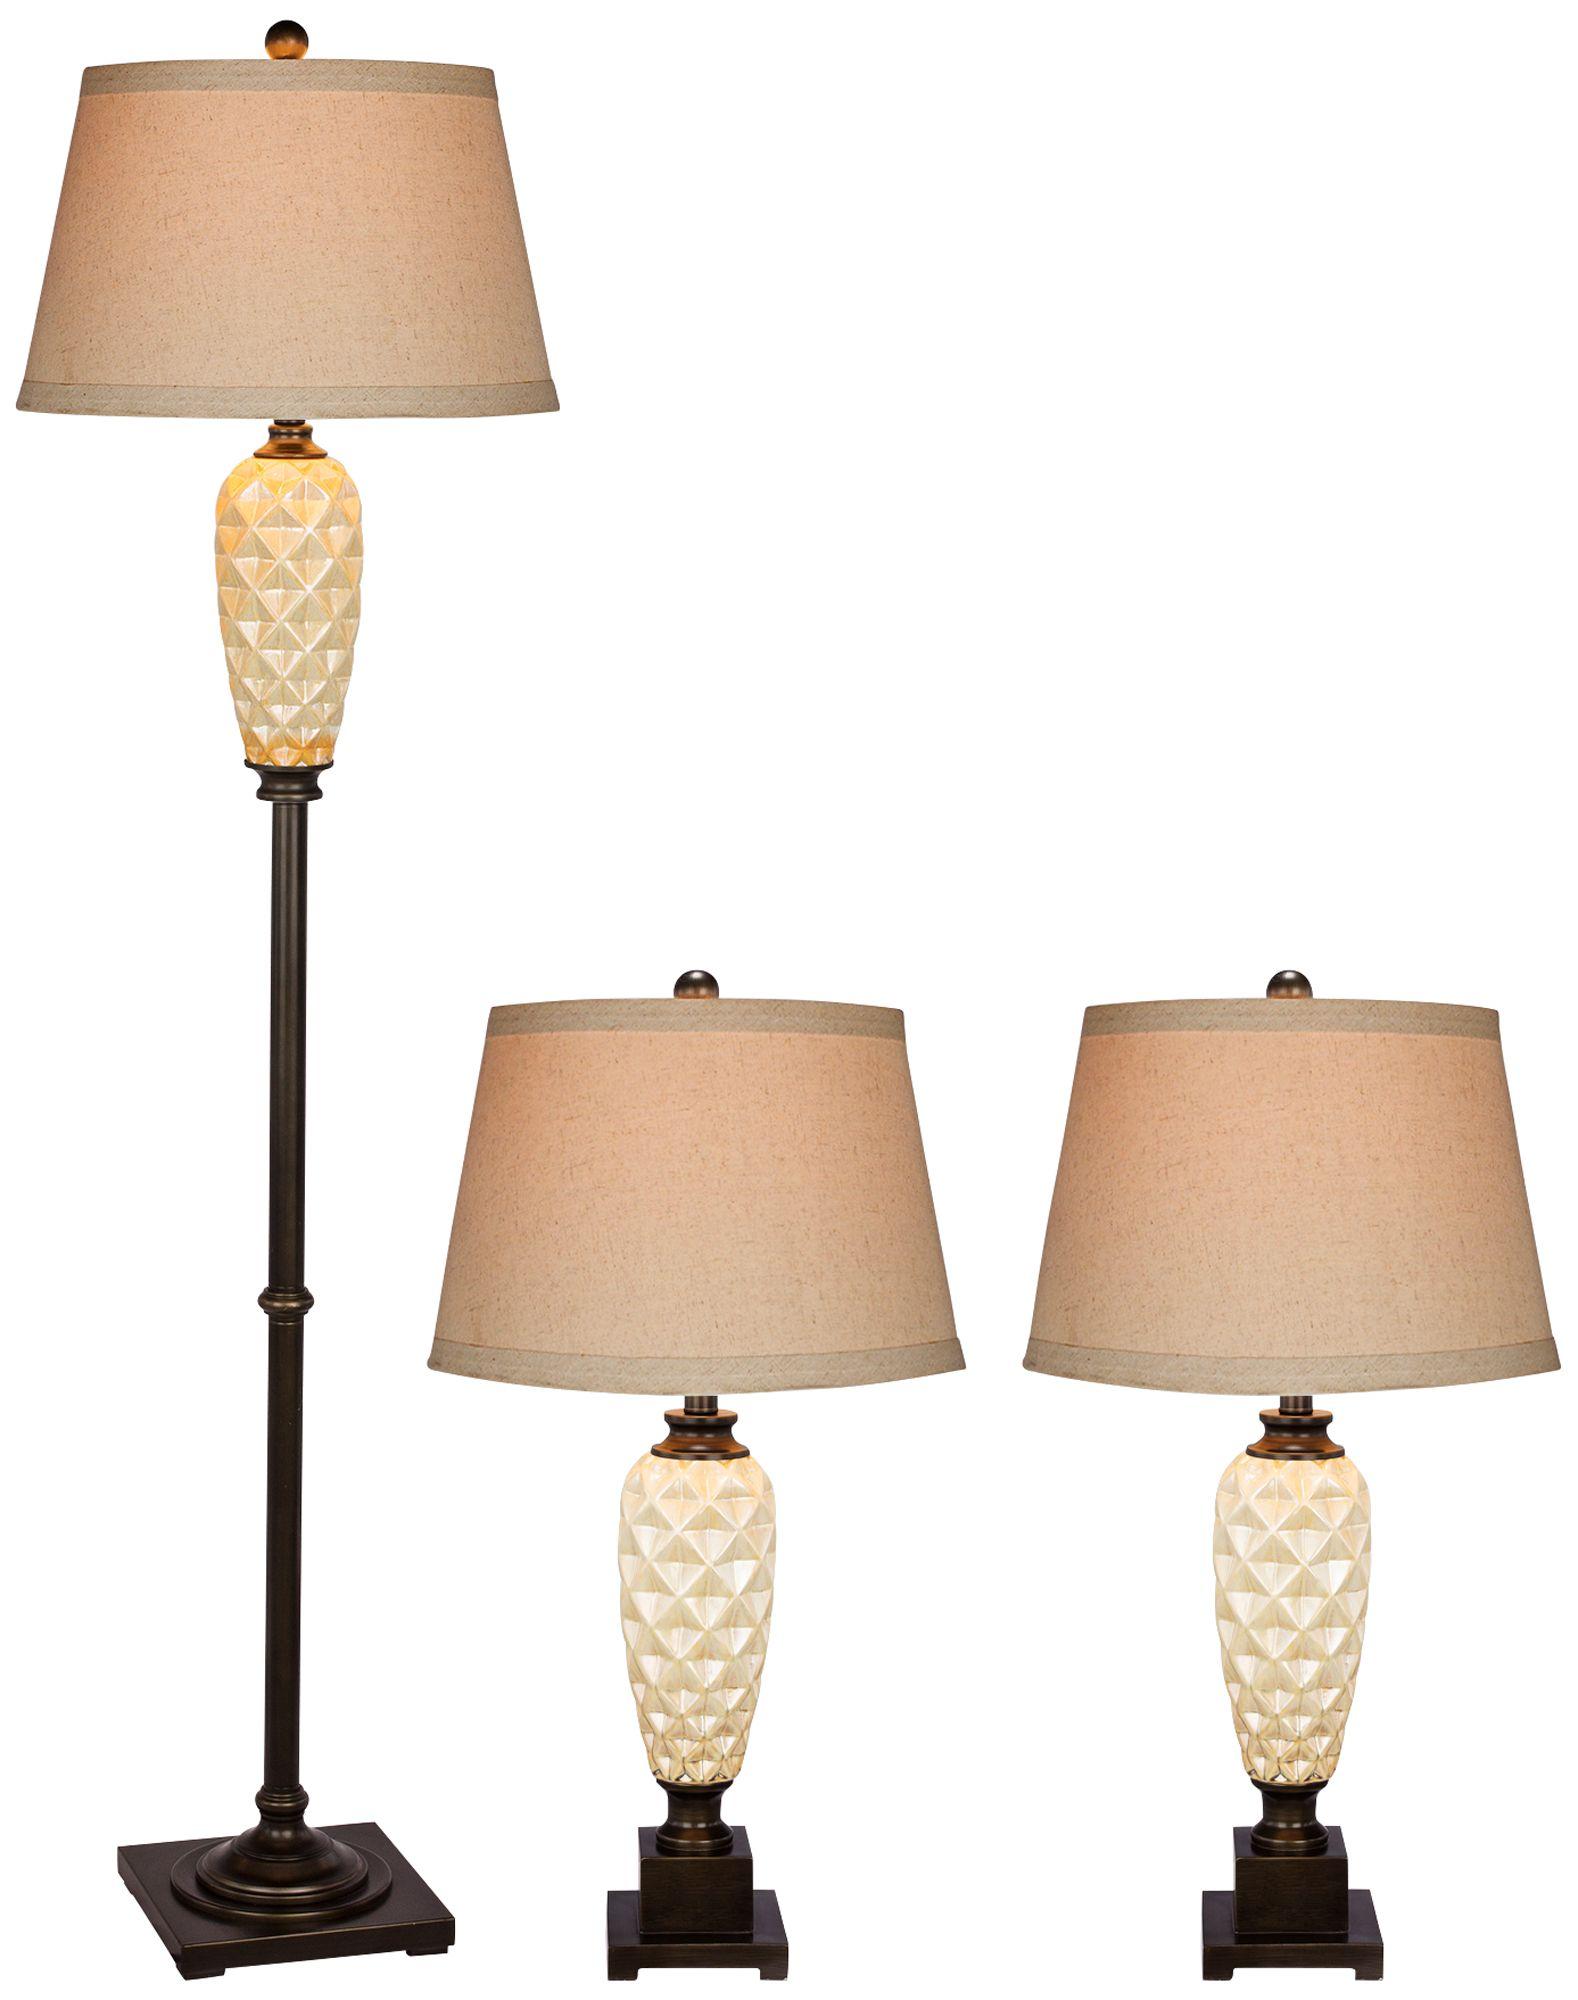 Ananas Madison Bronze Ceramic Floor and Table L& Set  sc 1 st  L&s Plus & Floor Lamp Sets - Matching Table u0026 Floor Designs | Lamps Plus